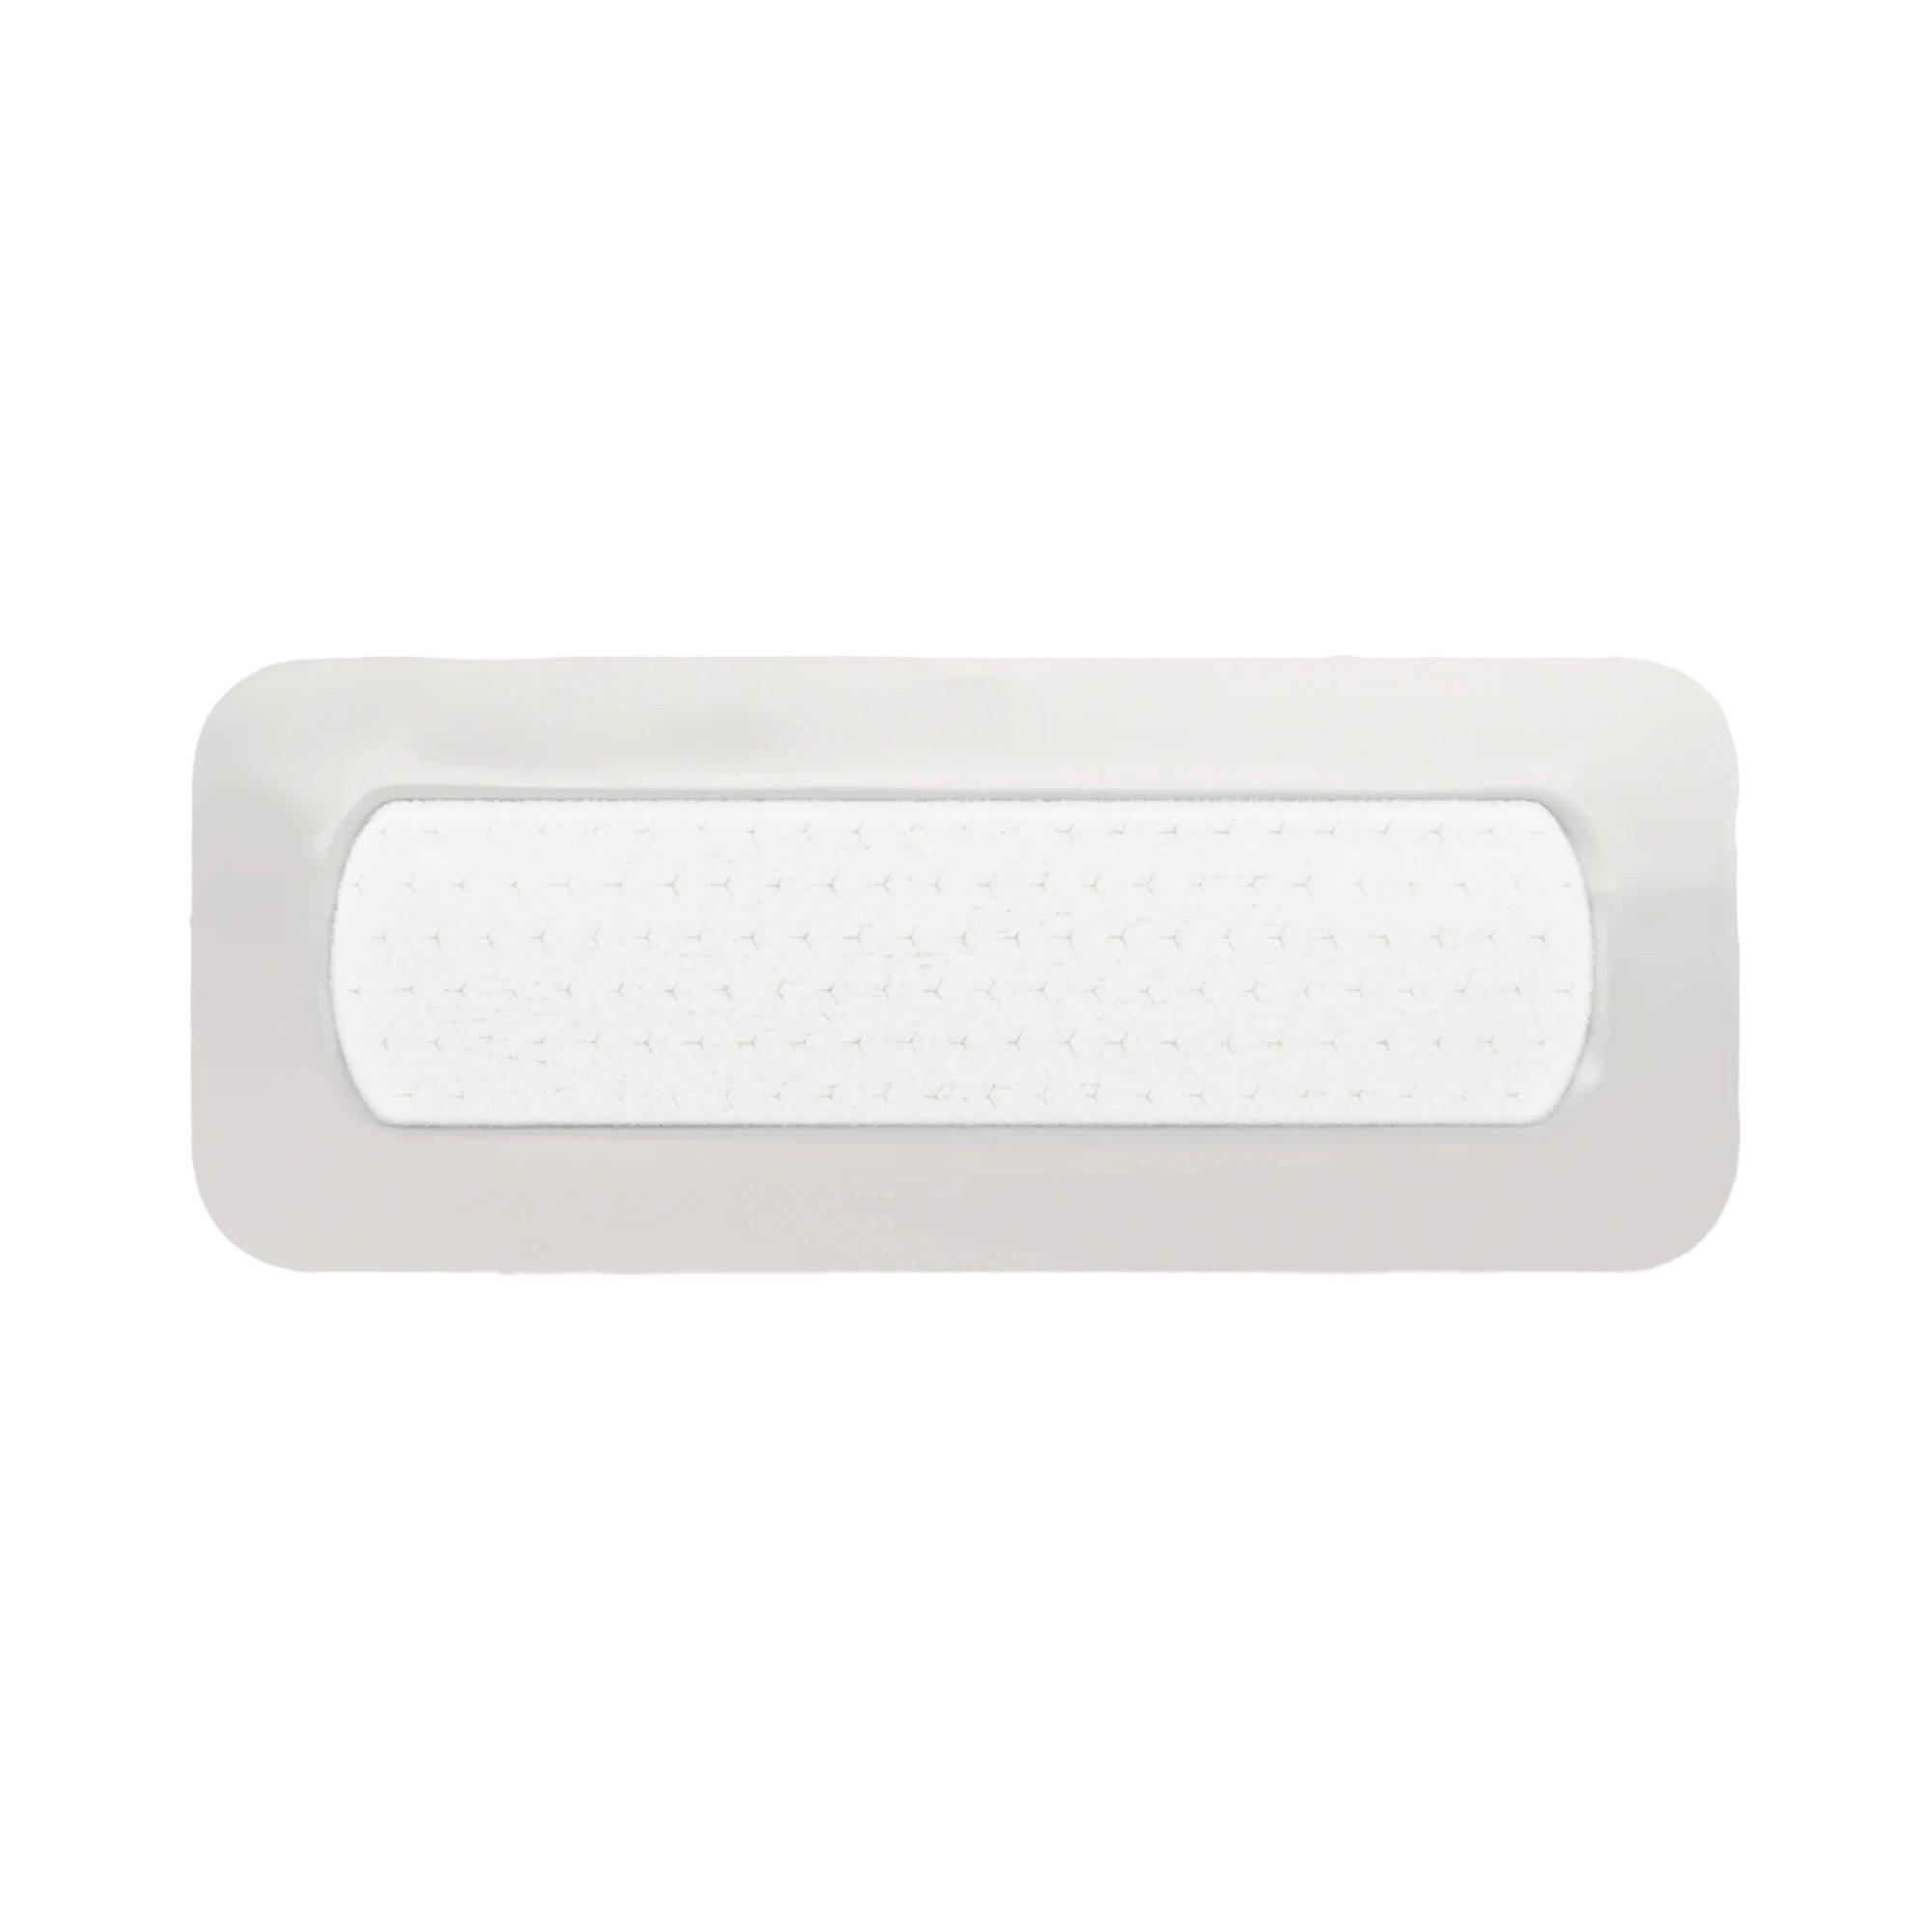 "Molnlycke Mepilex Border Post-Op Adhesive with Border Foam Dressing, 4 X 6"", 496300, Box of 10"